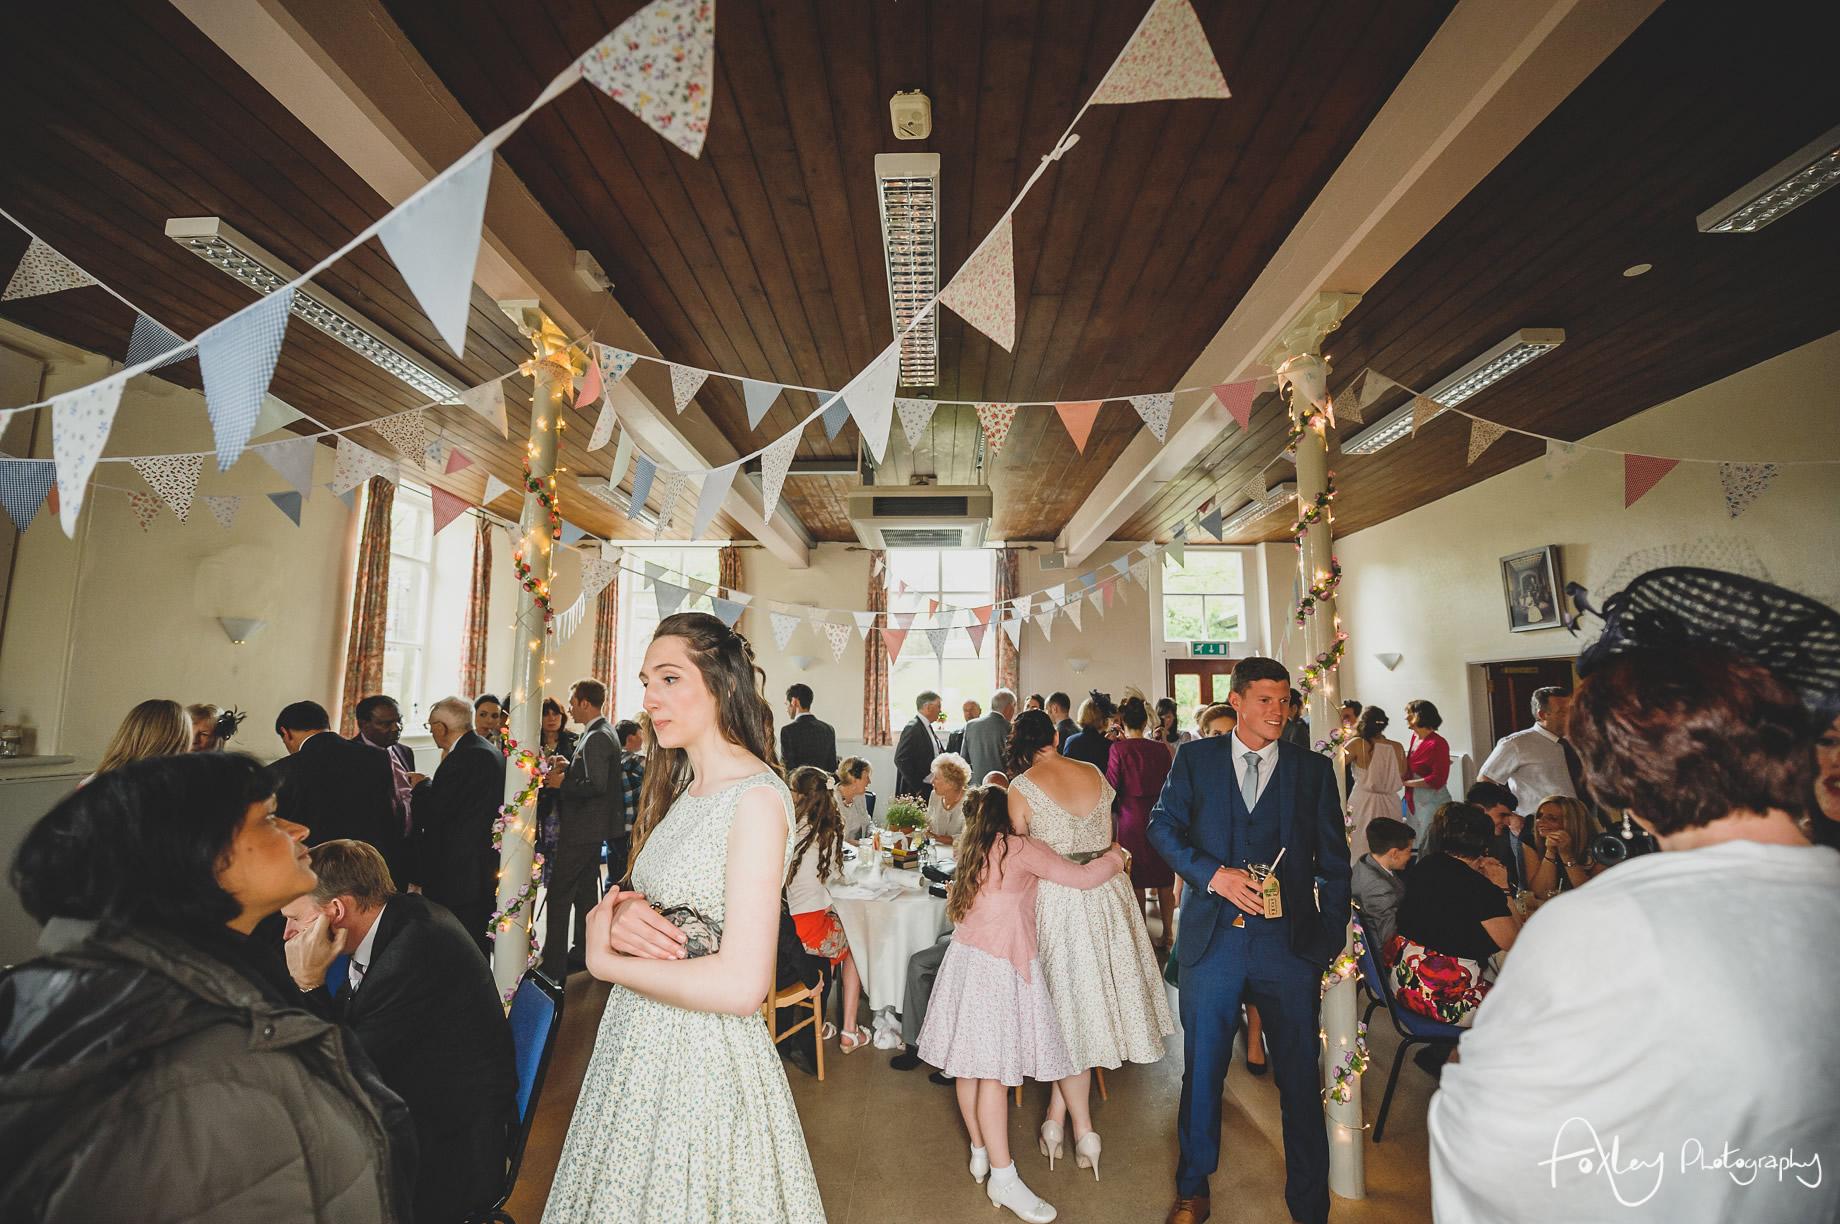 Mel-and-Lewis-Wedding-at-Barley-Village-Hall-139